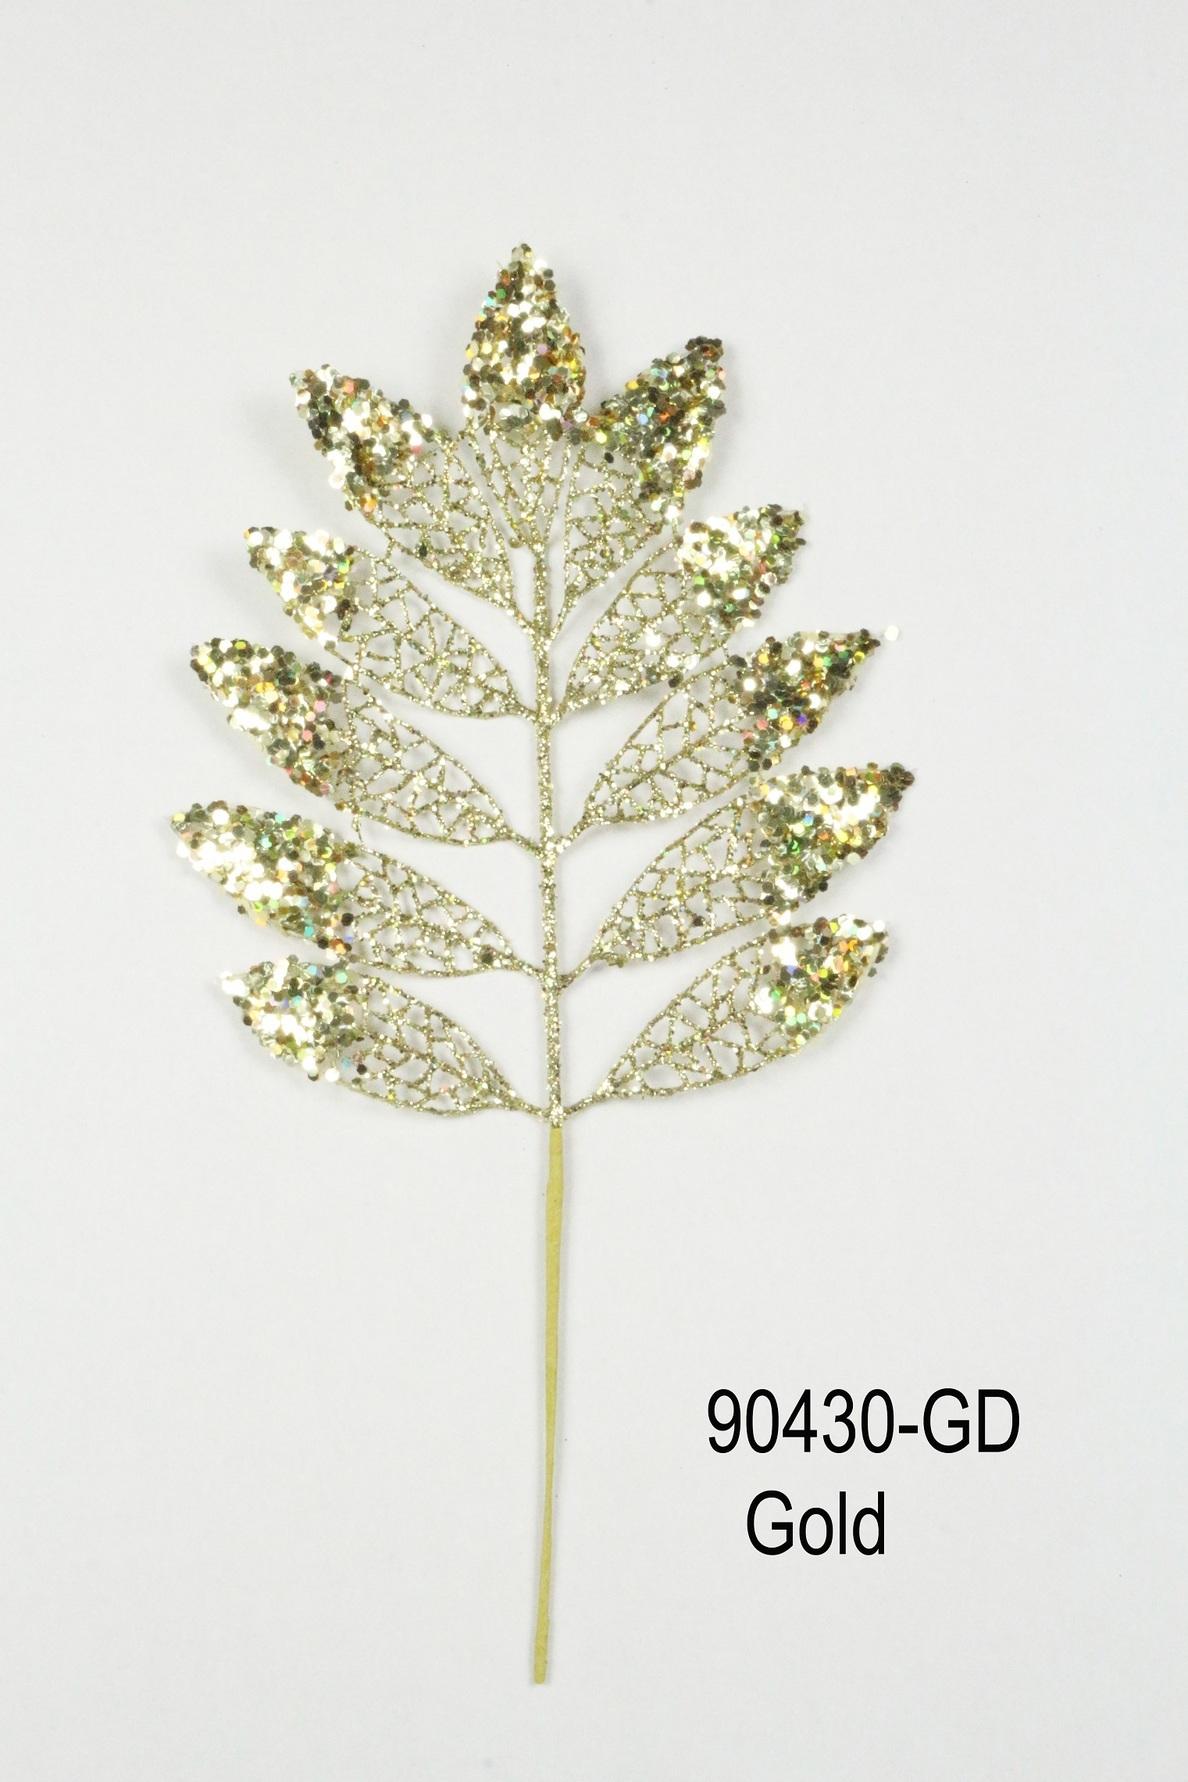 90430-GD